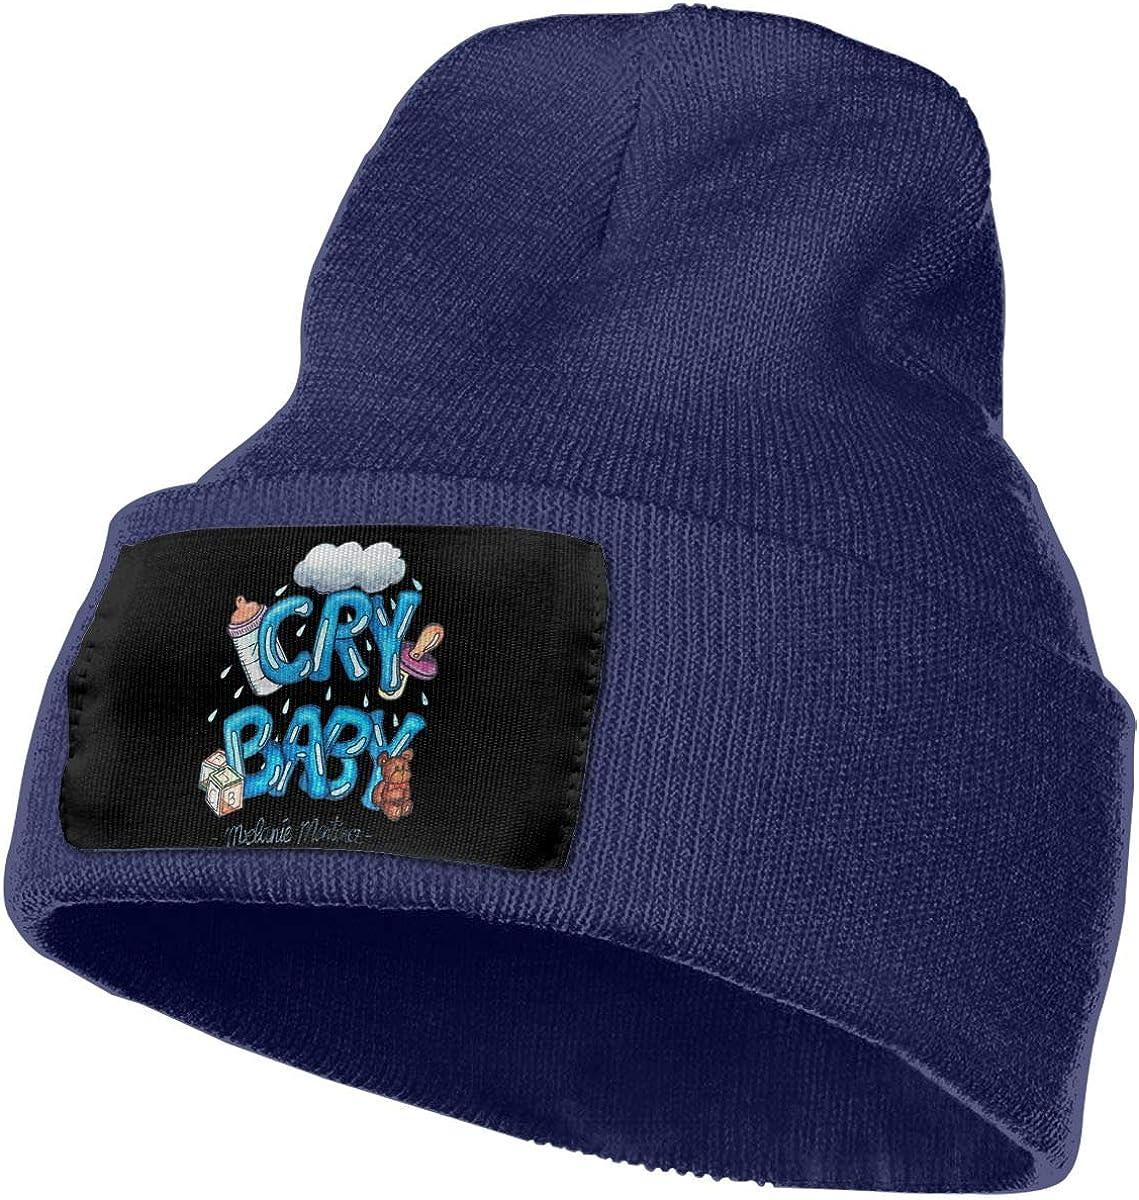 KennedyF Melanie Martinez Cry Baby Skull Hats Cap Beanie Cap Hat Ski Hat Cap Black